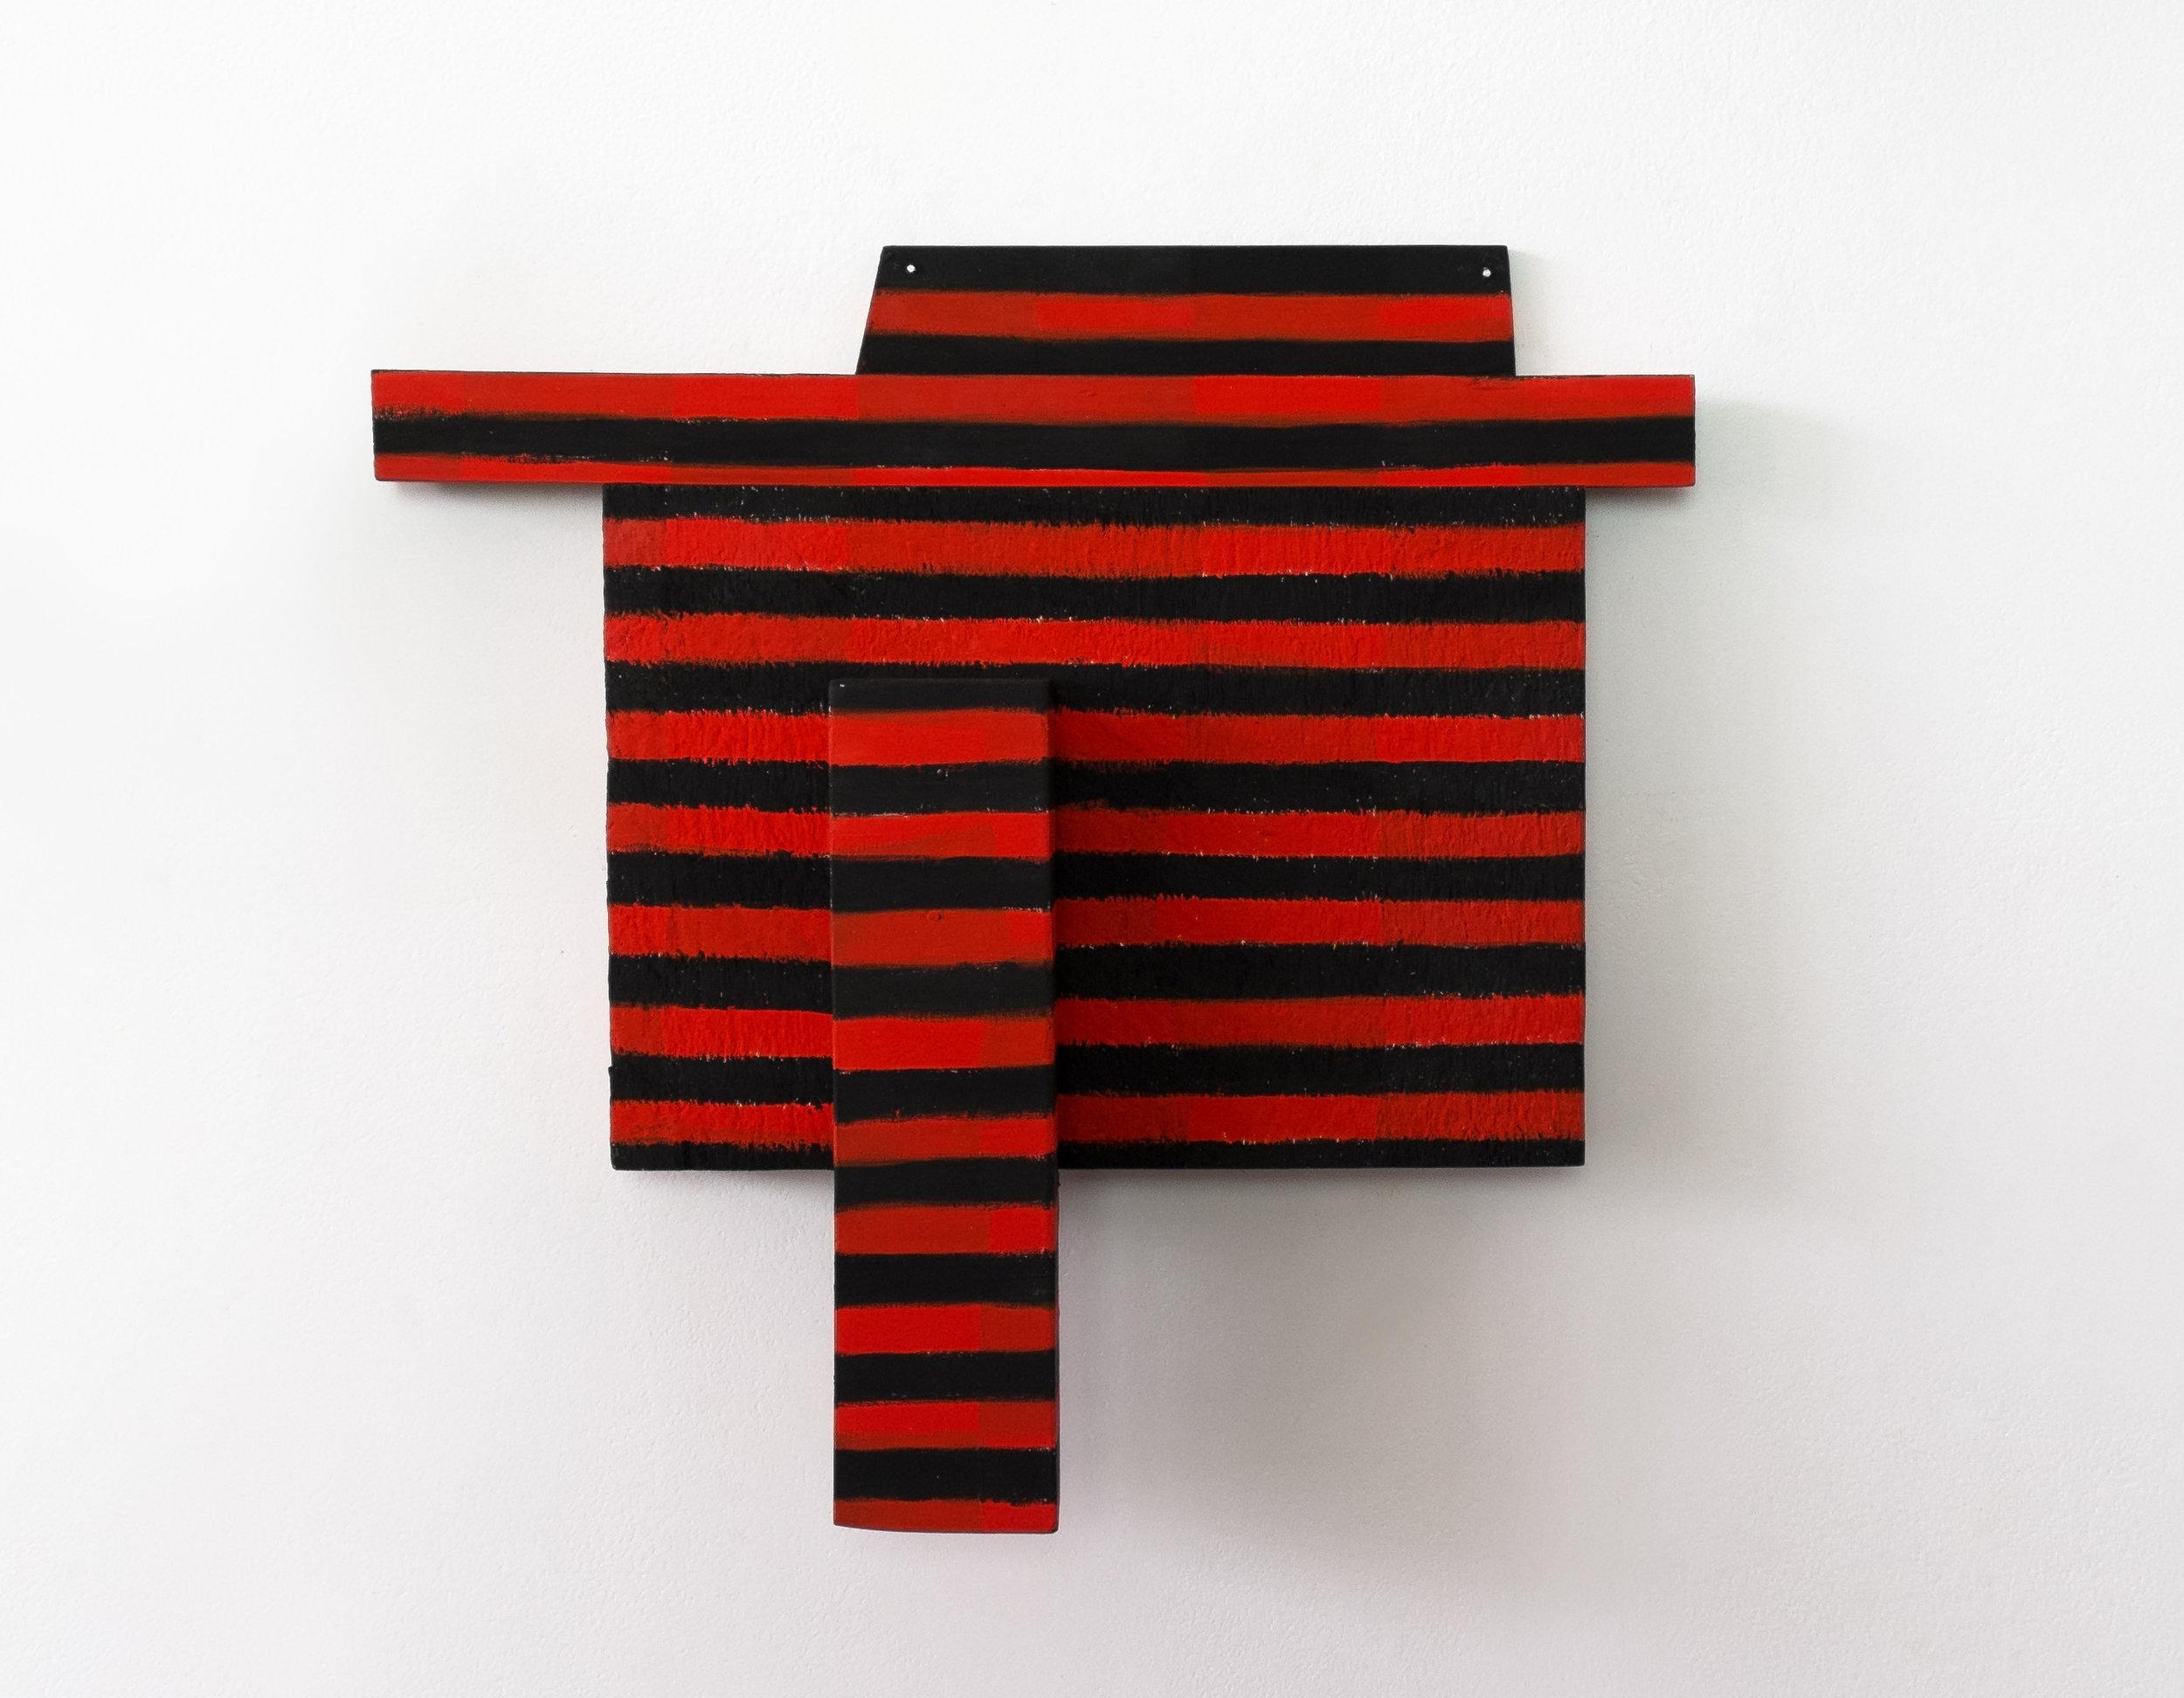 "Untitled (no. 521), 2014, wood, paint, nails, screws, 11 ¼ x 2 ½ x 11"""